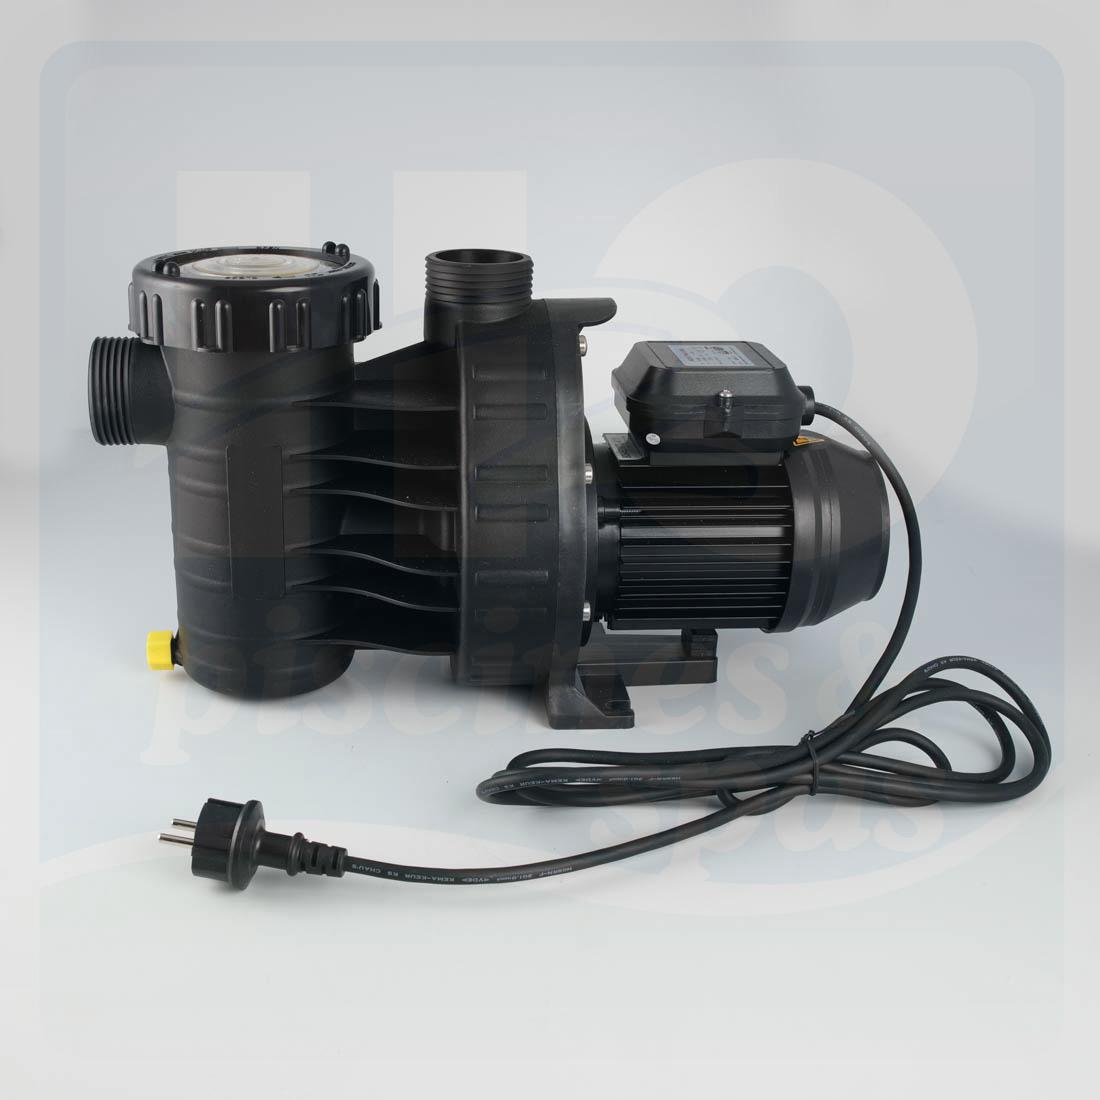 pompe de filtration speck aquaplus 6 0 6 cv 6m3 h. Black Bedroom Furniture Sets. Home Design Ideas